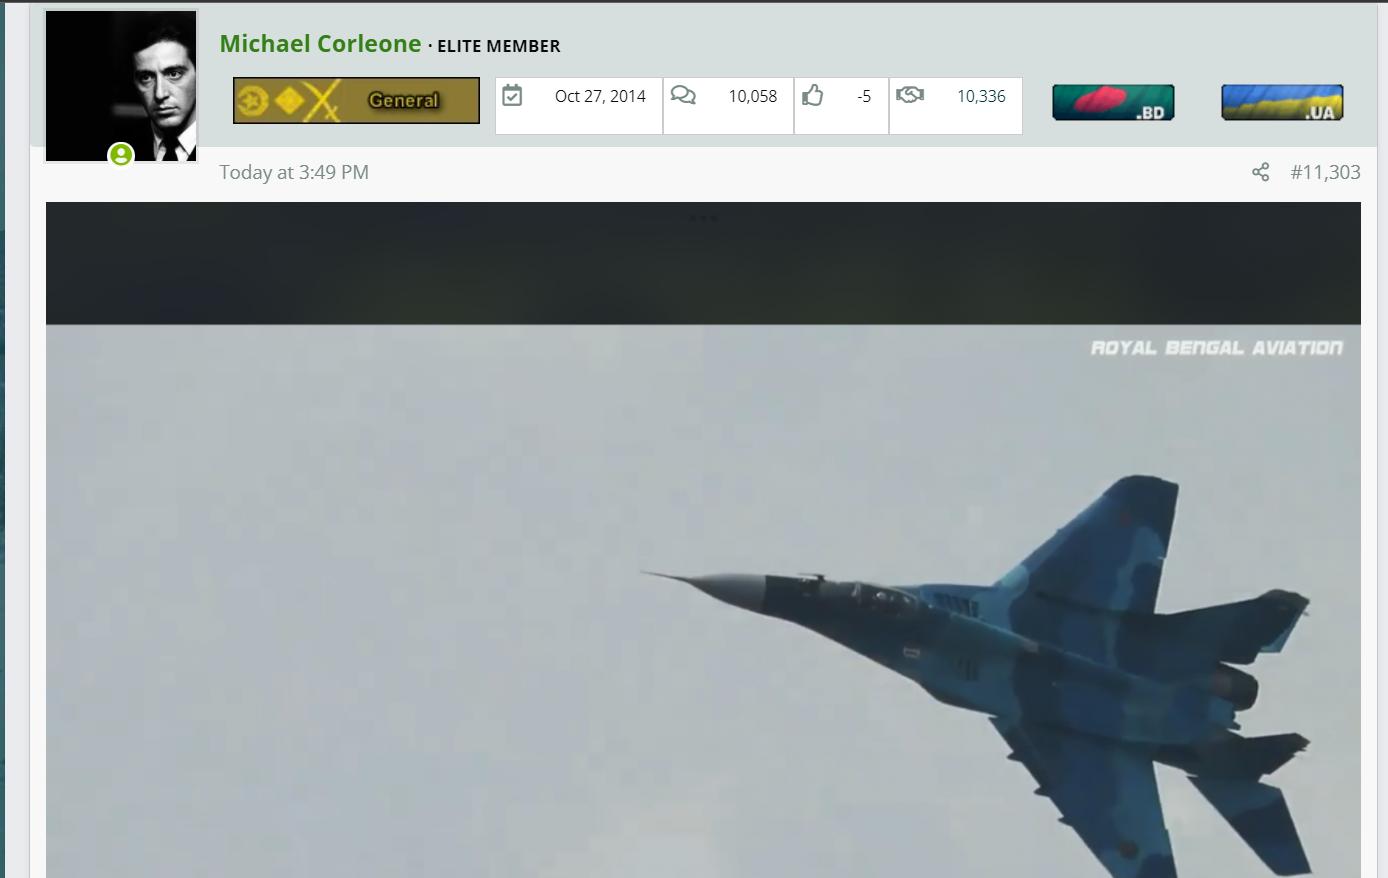 Screenshot 2021-09-30 182054.png